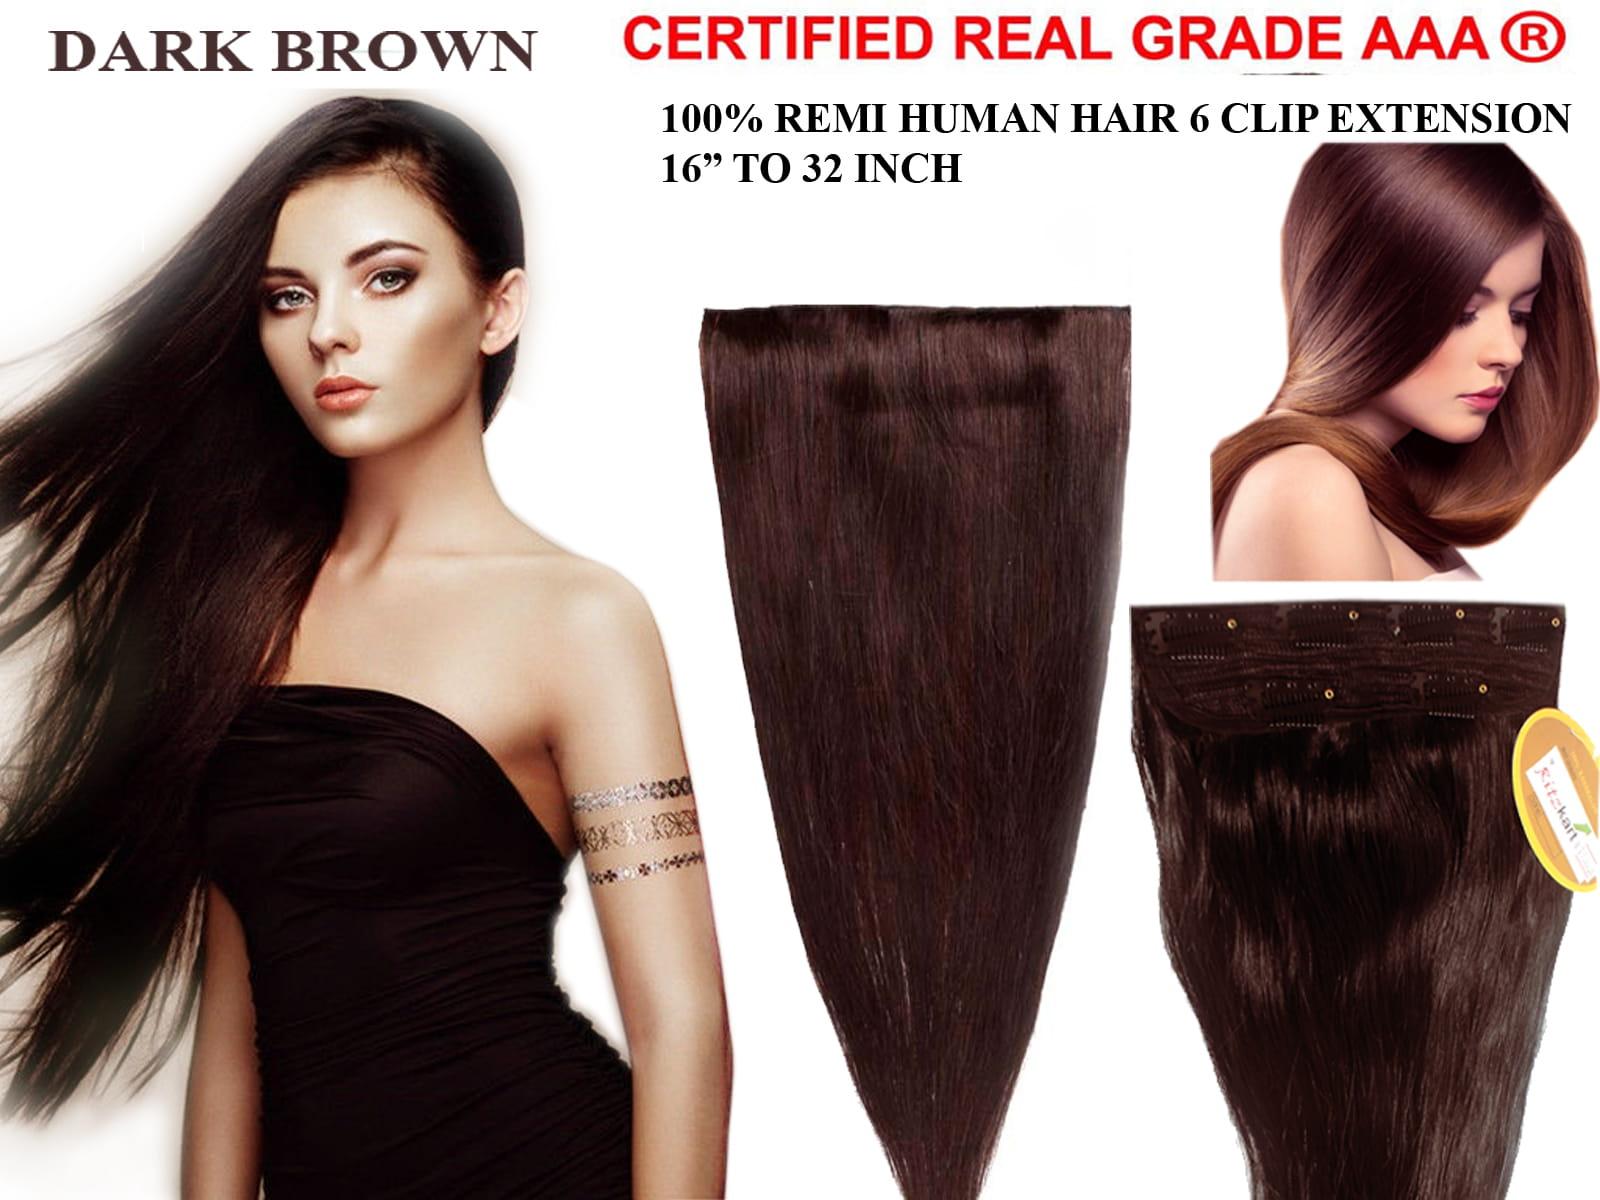 Ritzkart 6 Clip Fine Quality 18 Inch Dark Brown Remi Human Soft